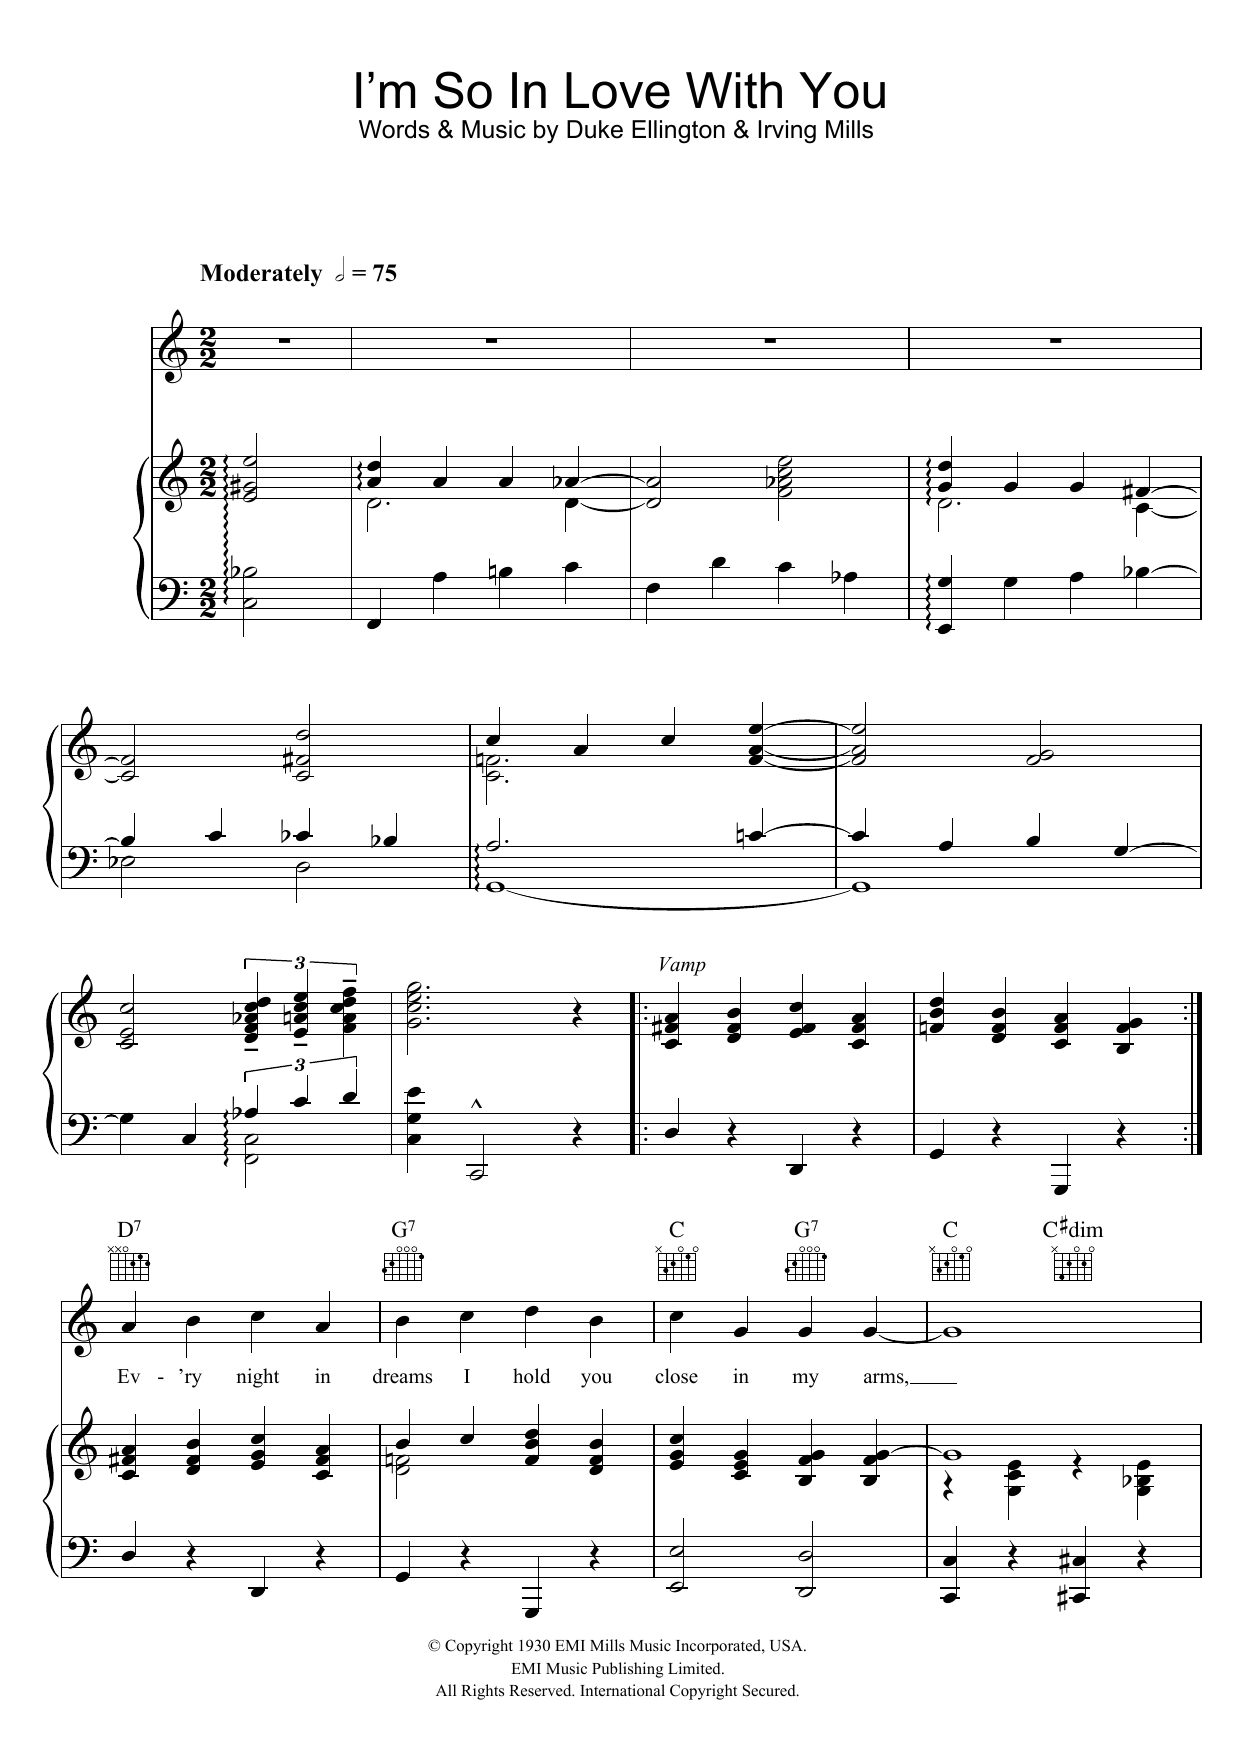 Duke Ellington: I'm So In Love With You